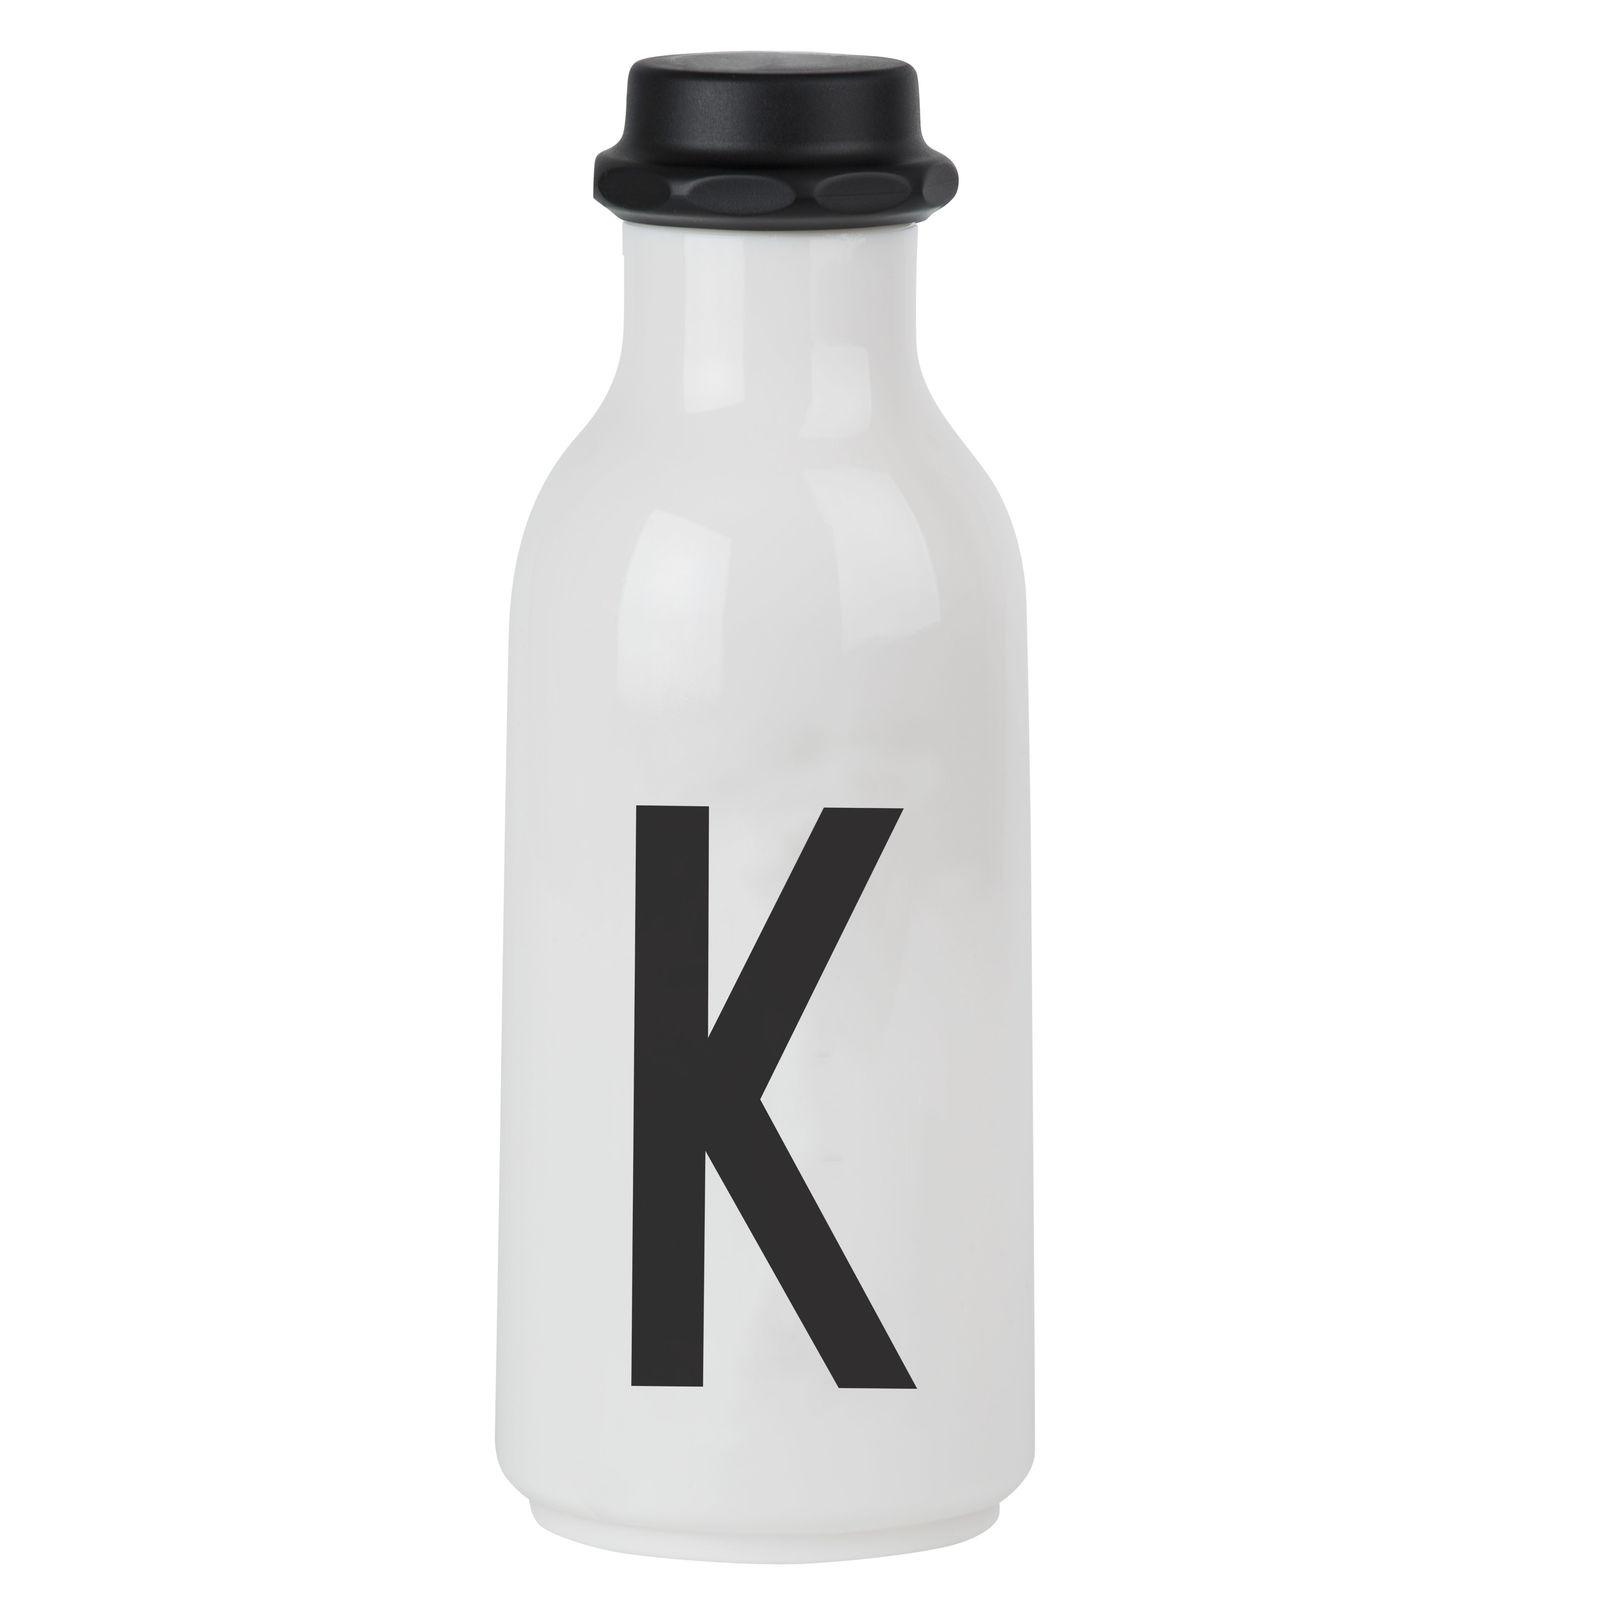 Design Letters - Personal Drinking Bottle - K (20202500K)